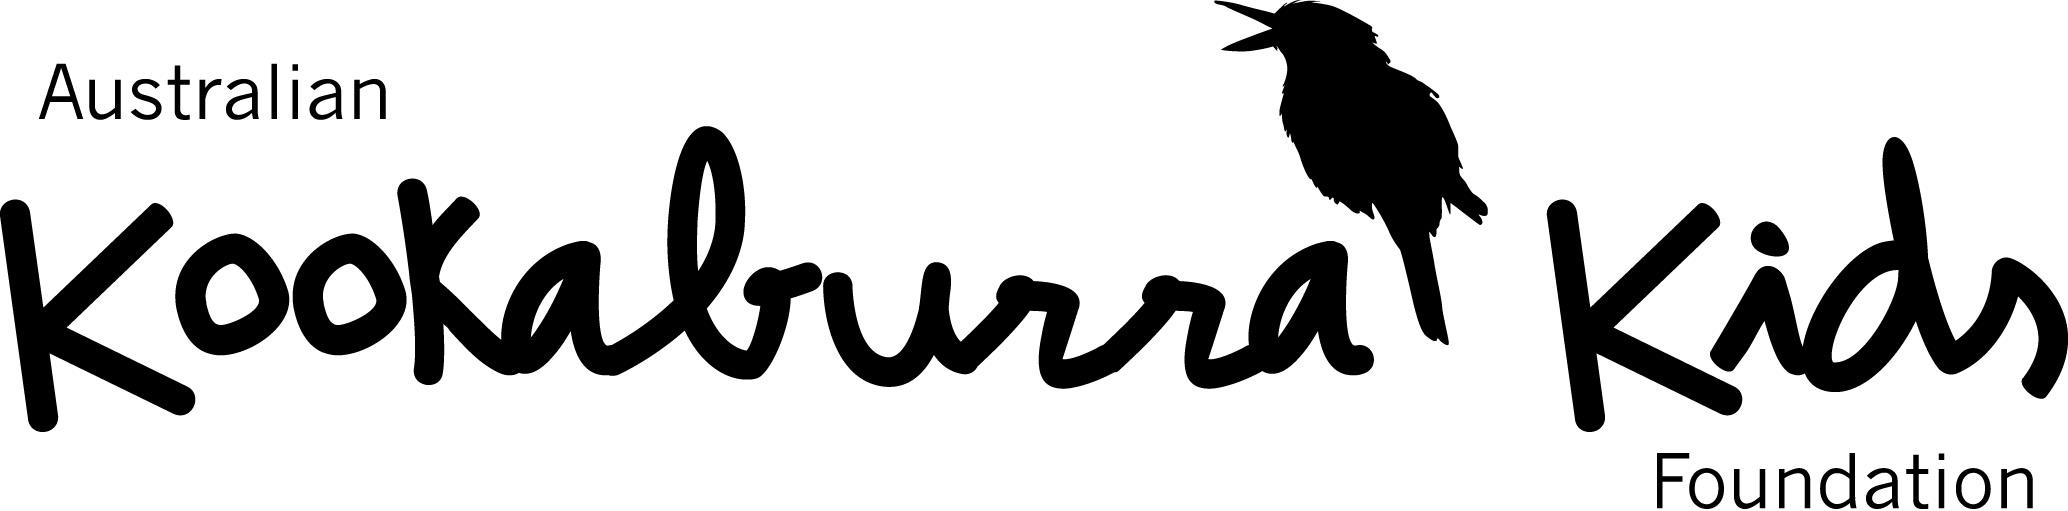 AKKF 2016 Foundation logo_black.jpg